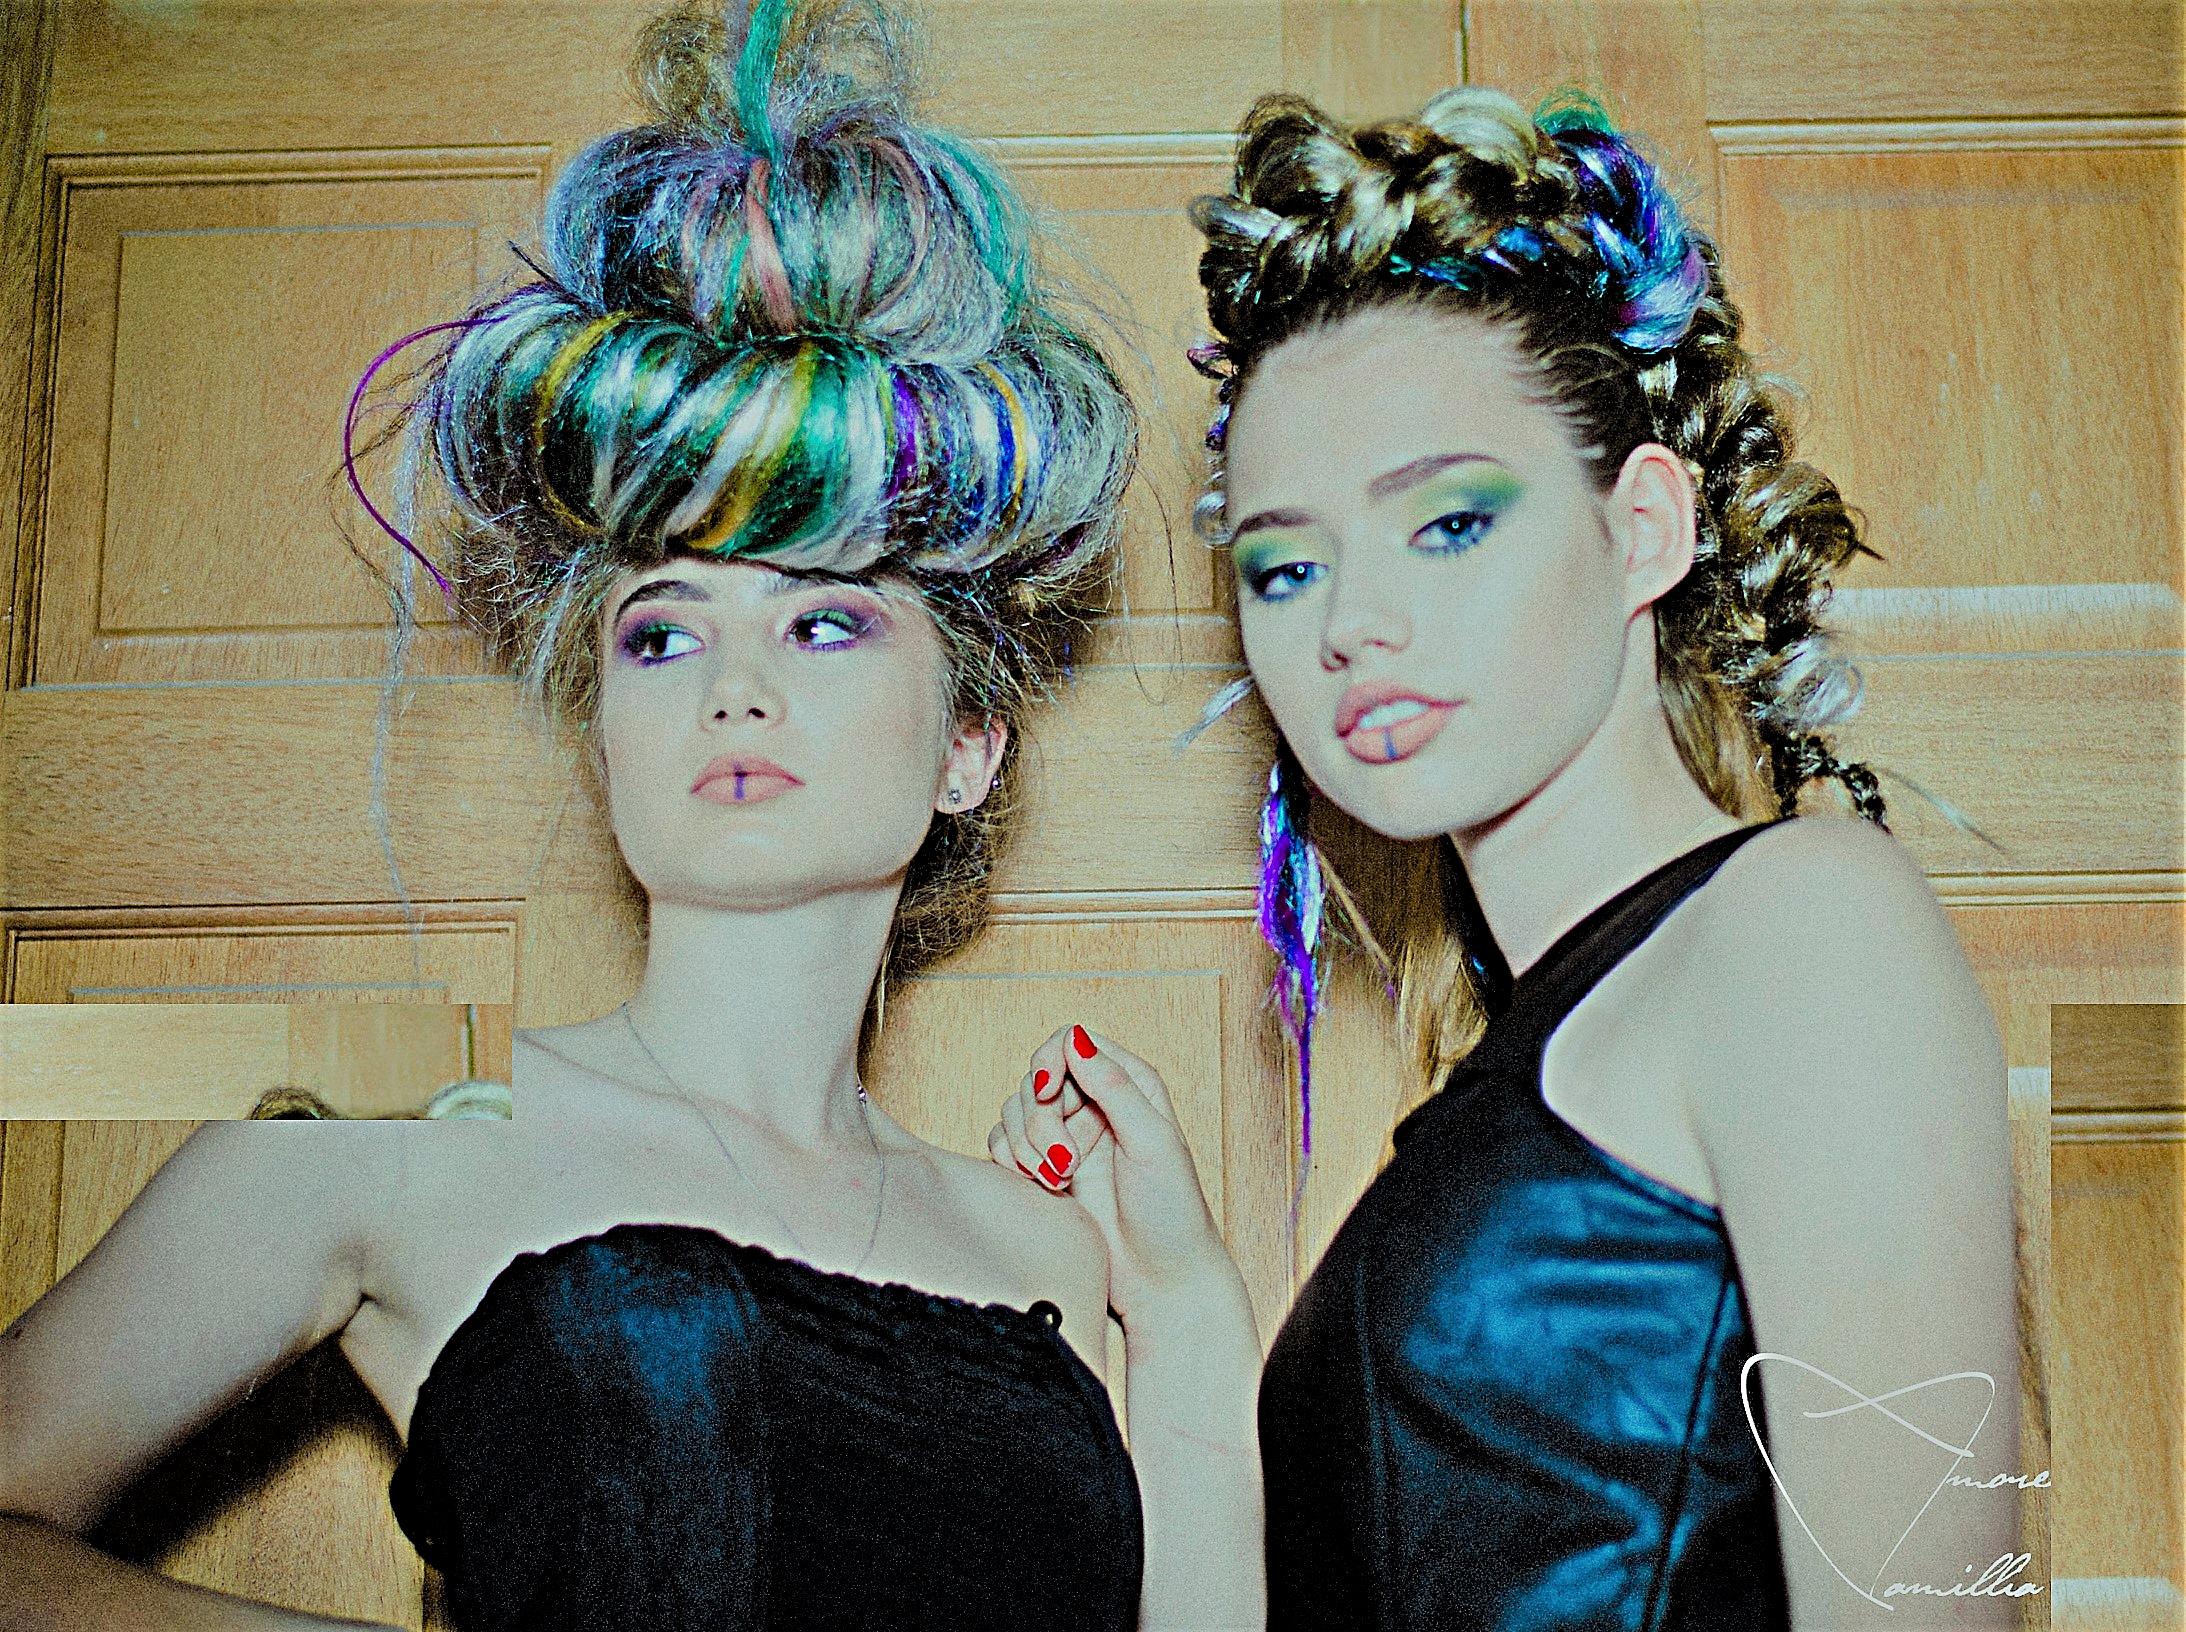 lola and maddy coloured hair.jpeg